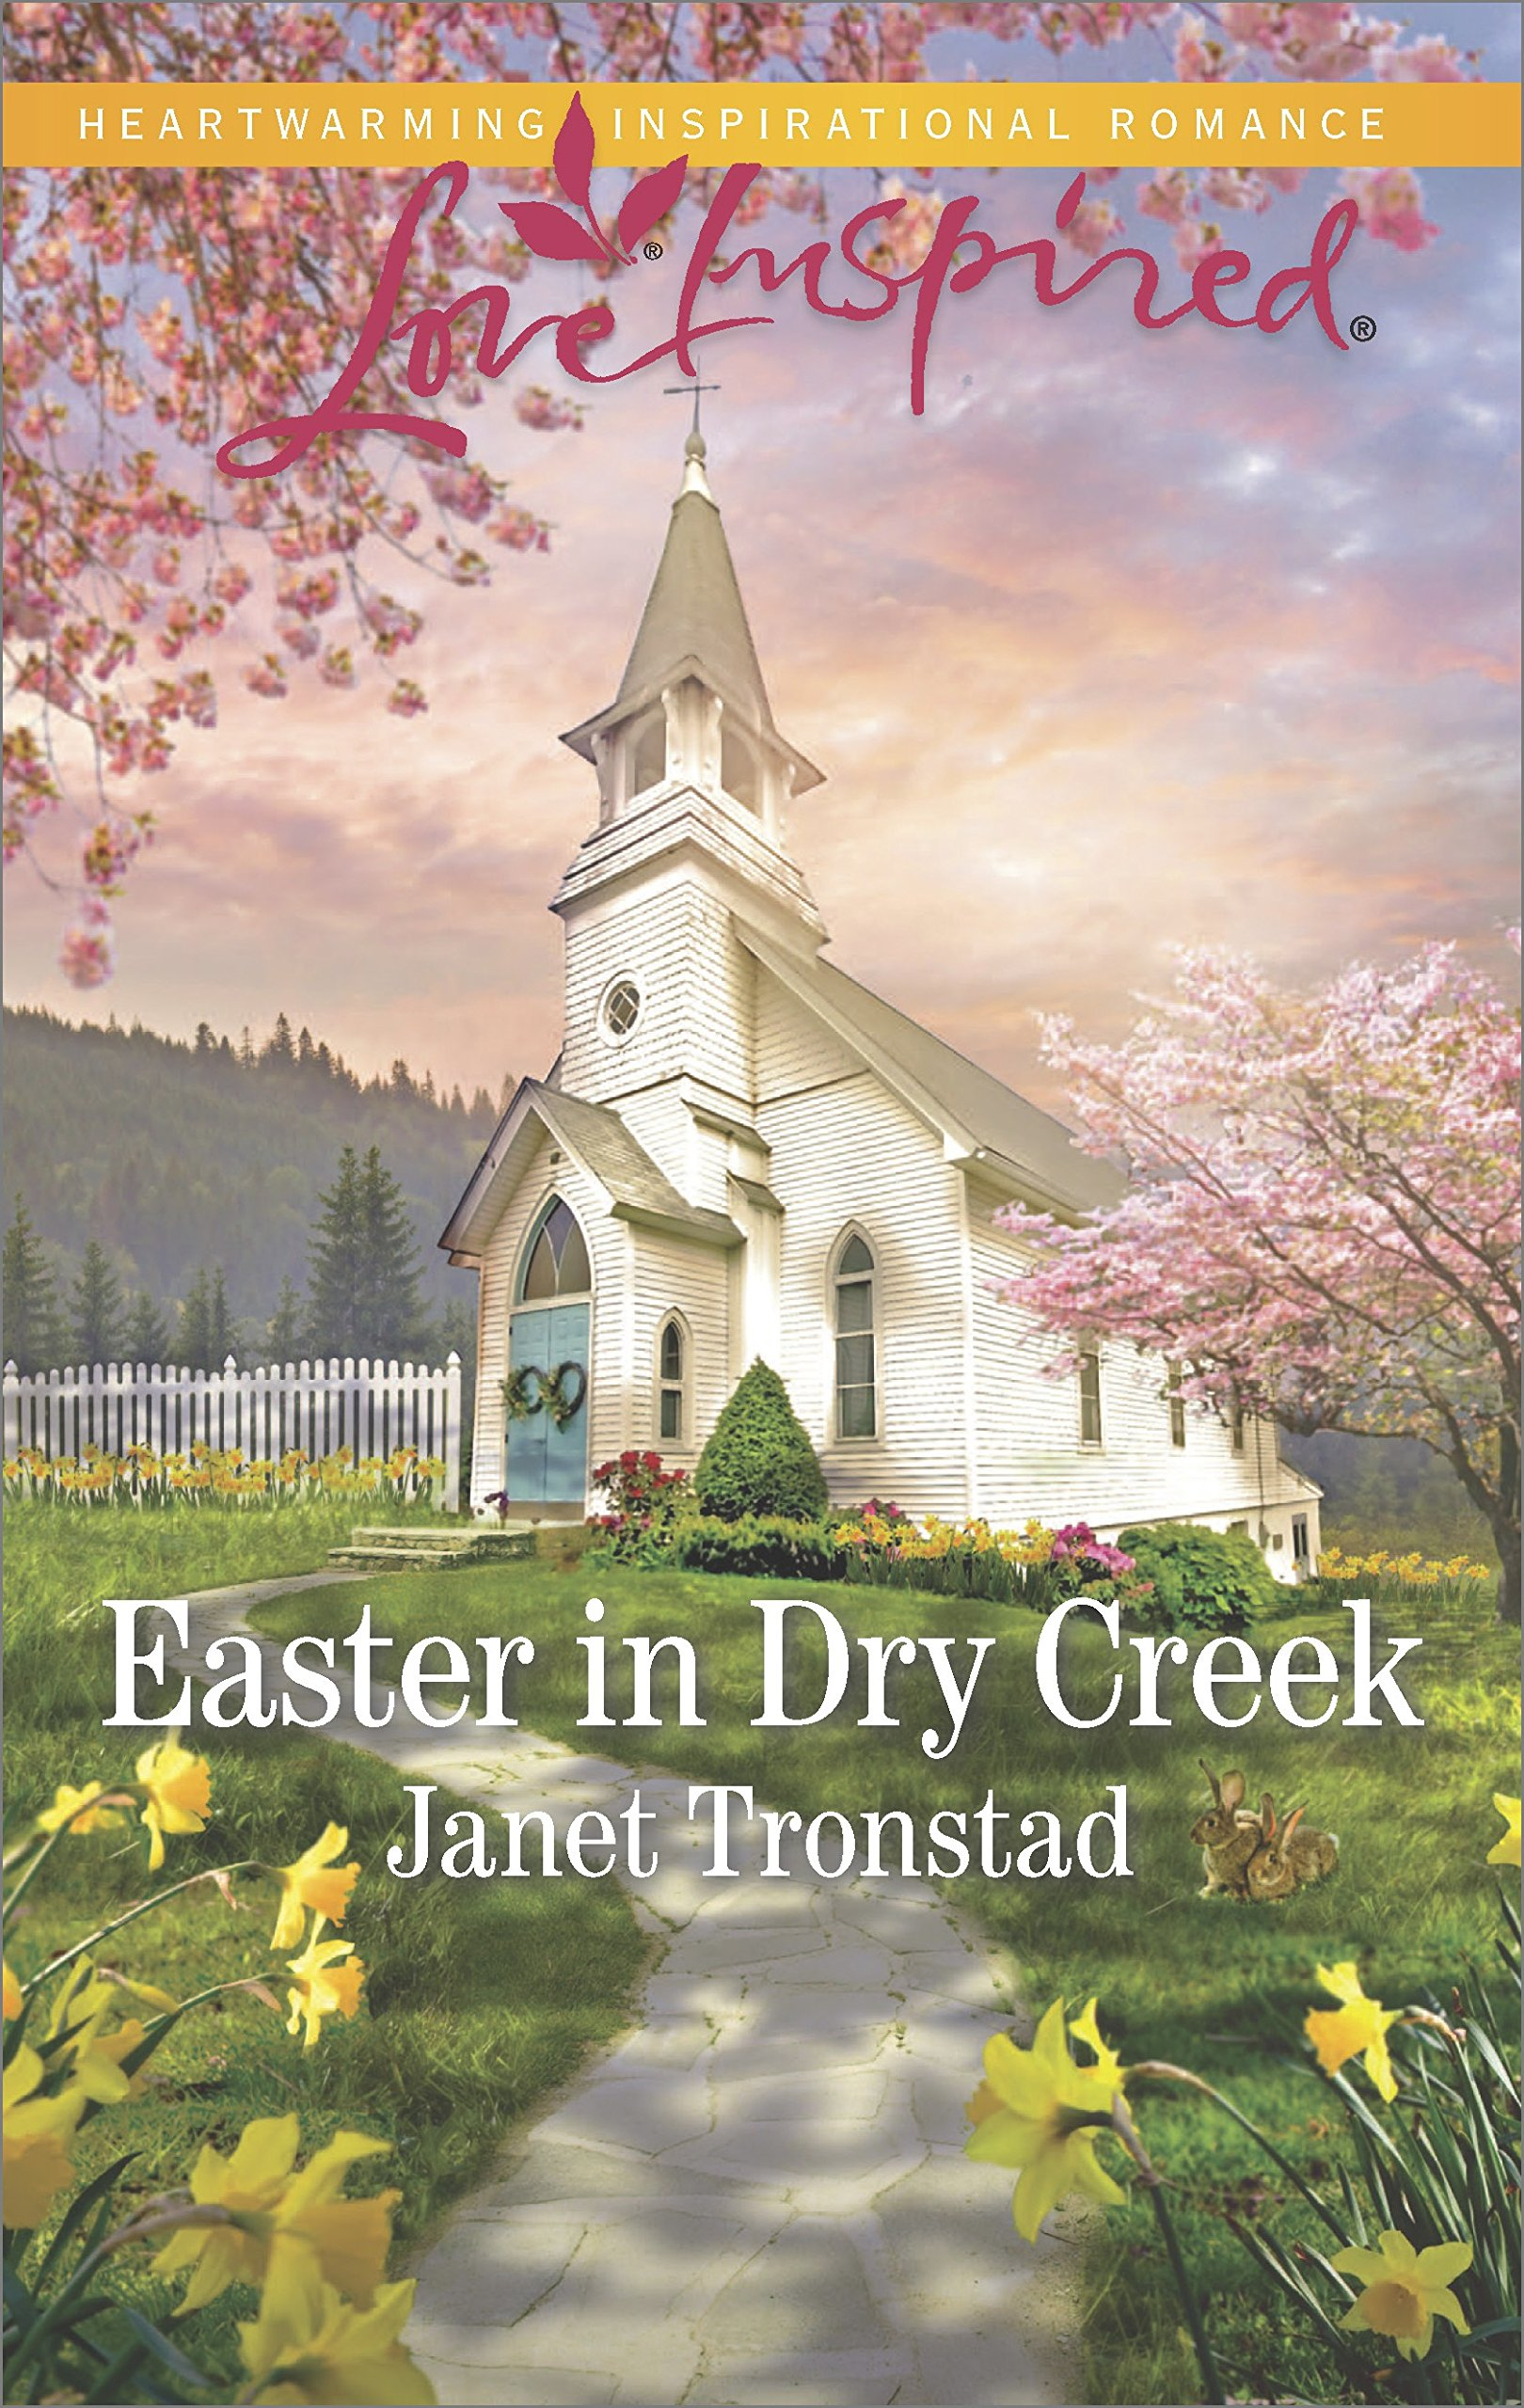 Easter Dry Creek Janet Tronstad